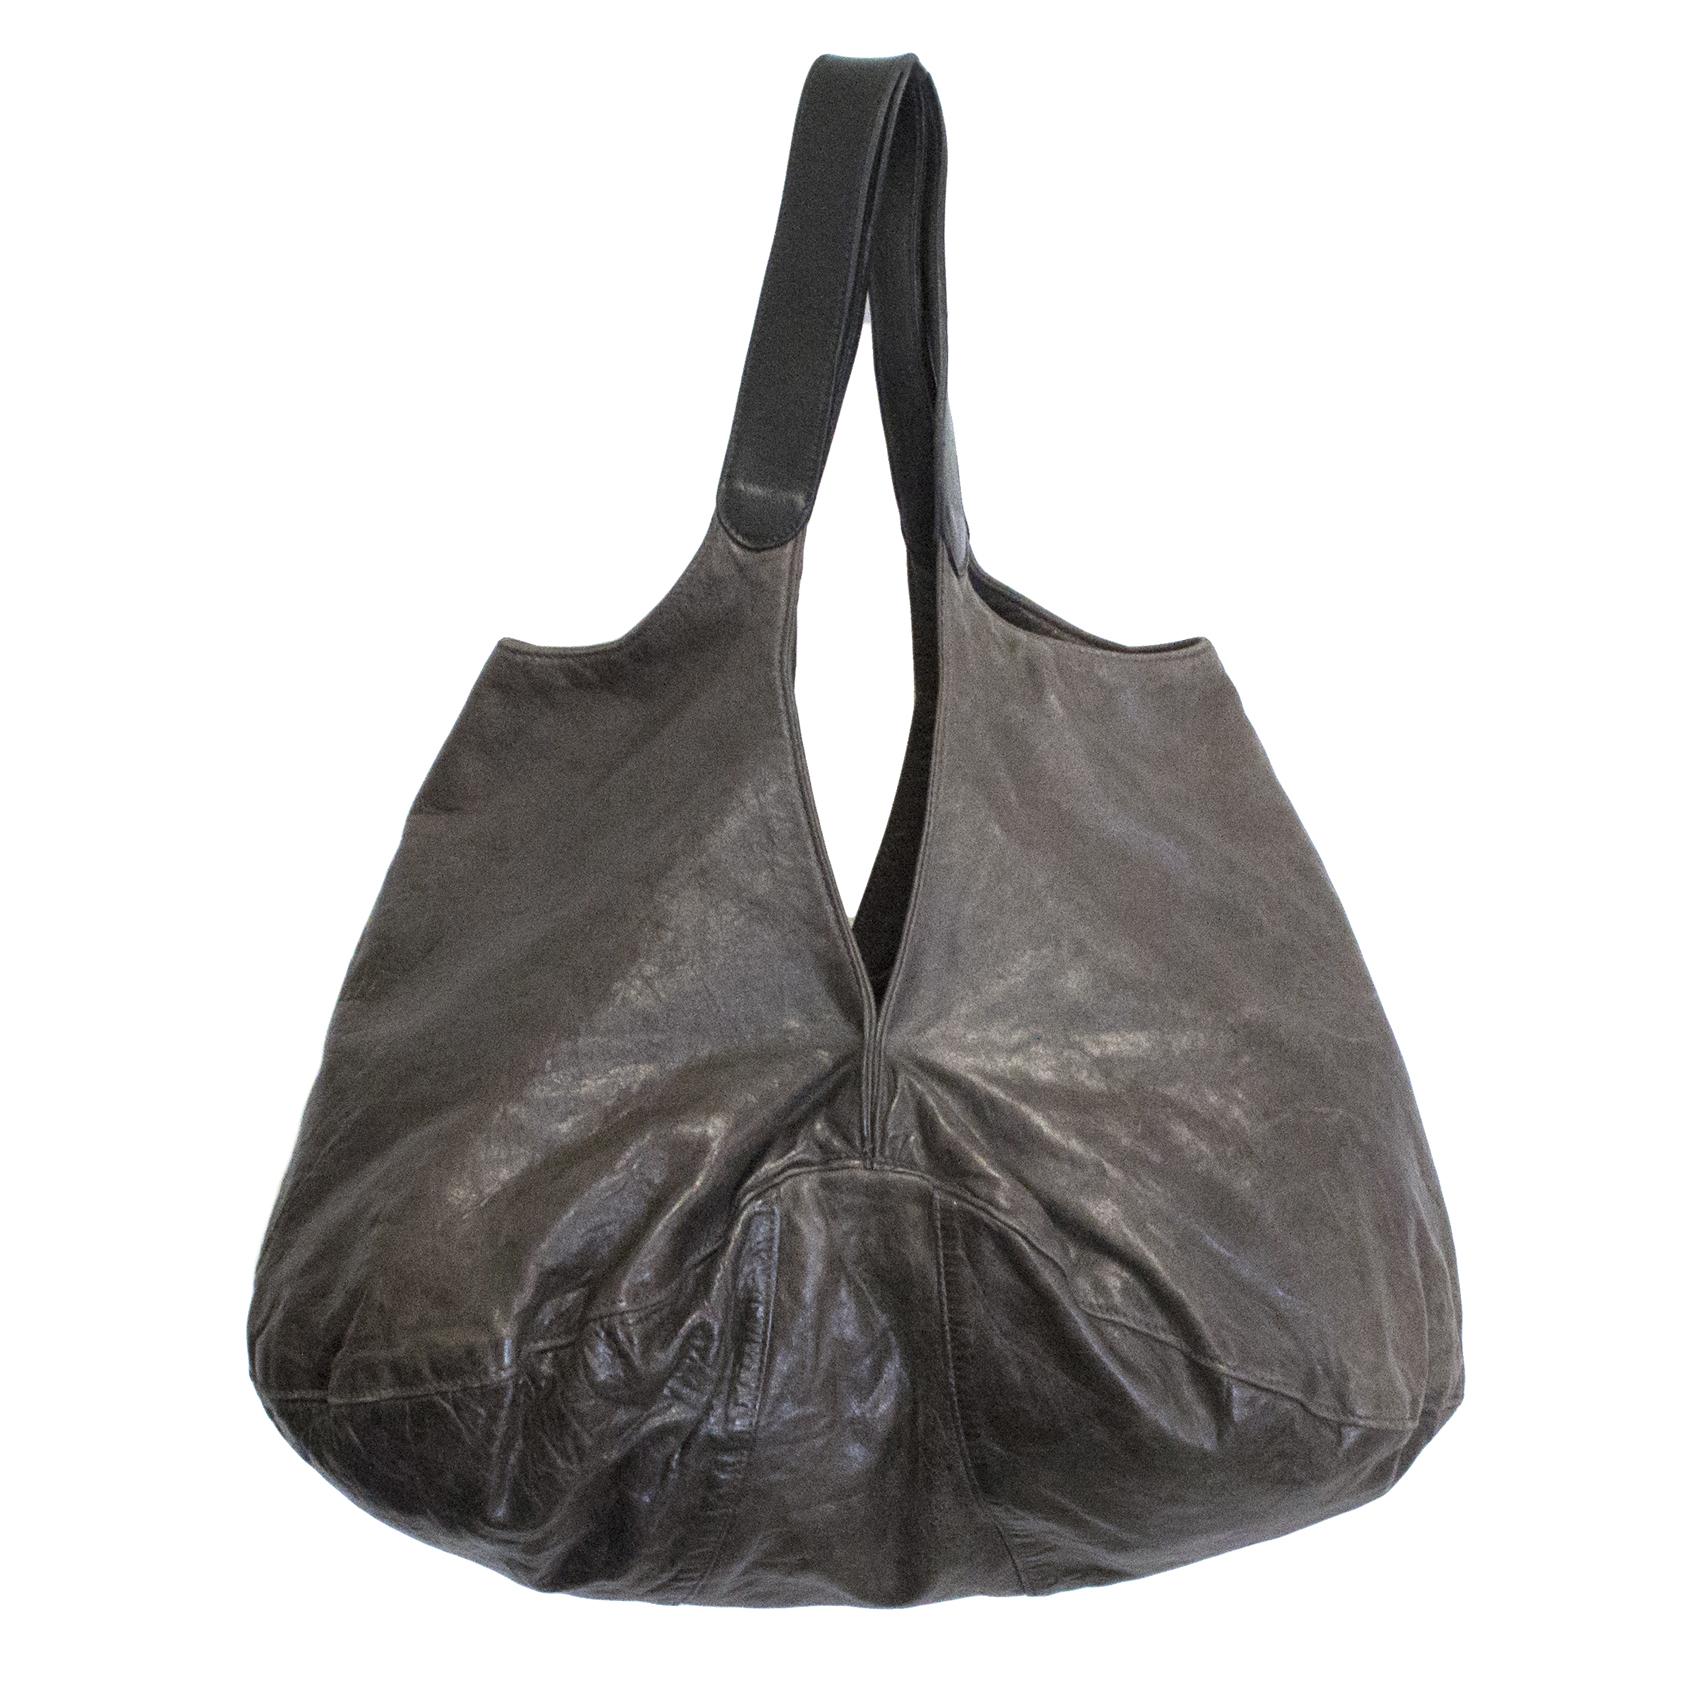 Zero + Maria Cornejo brown leather handbag